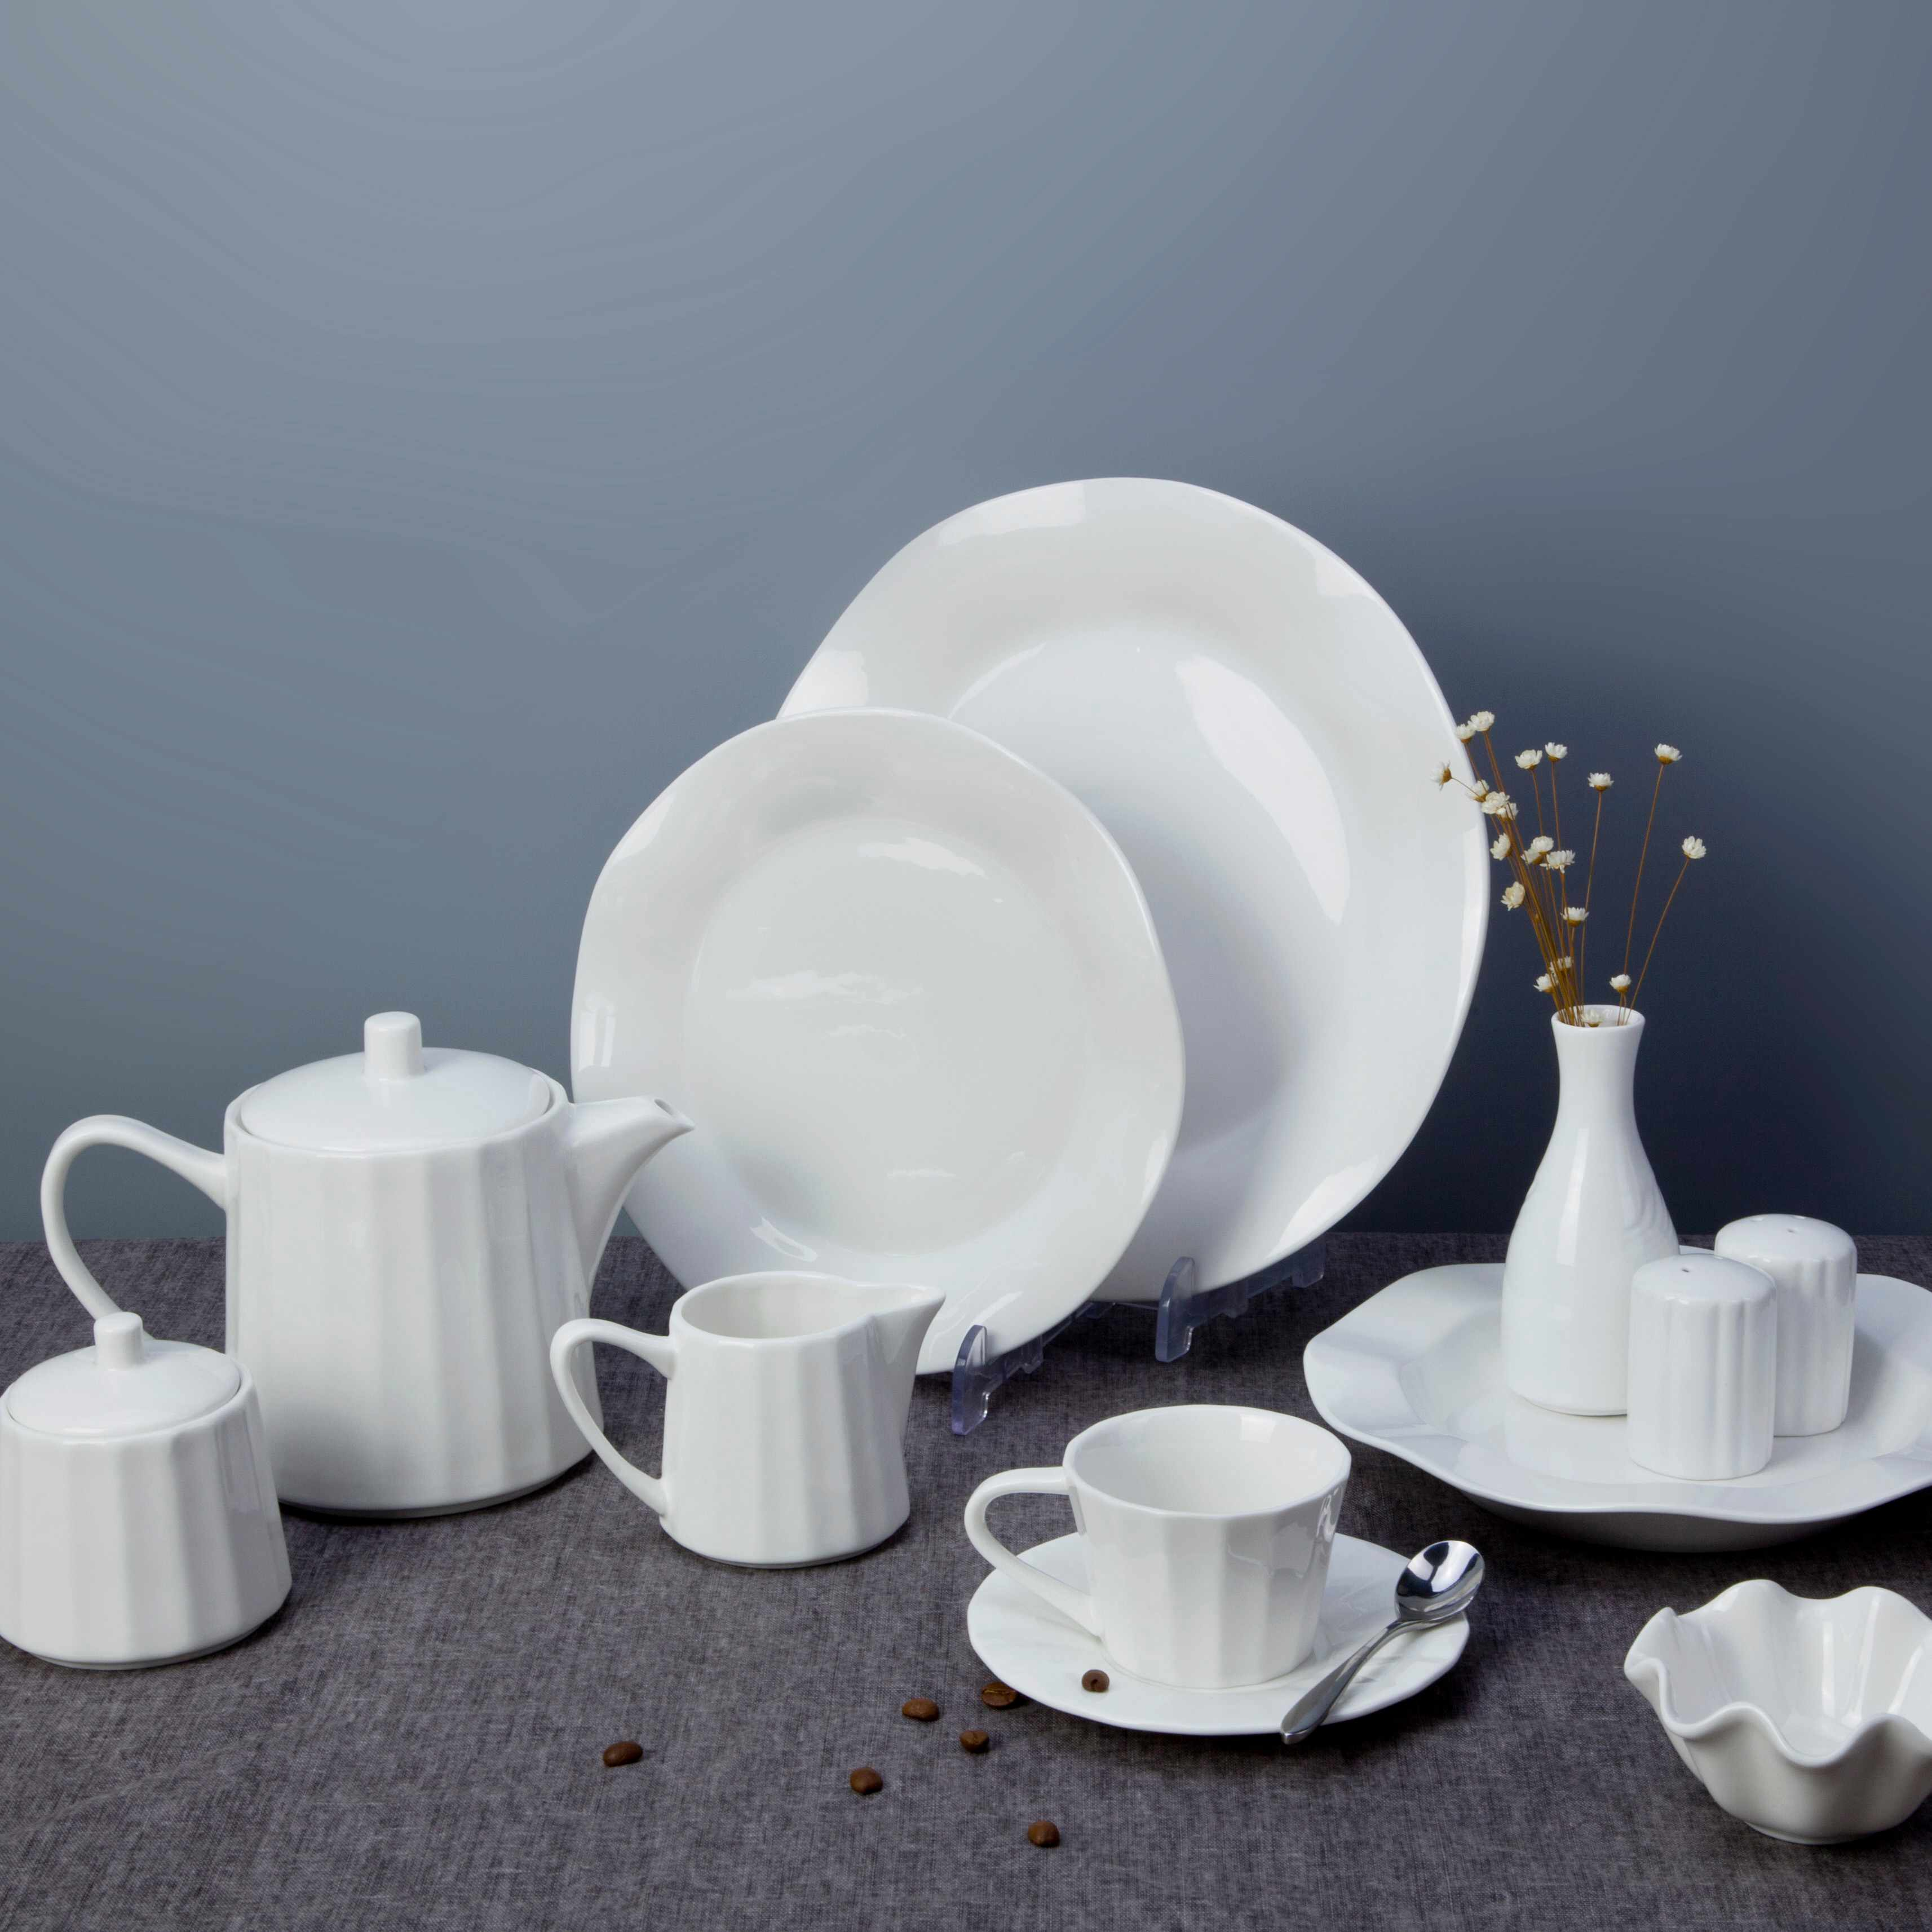 Two Eight White ceramic dinnerware set - FENG YUN SERIES White Porcelain Dinner Set image2